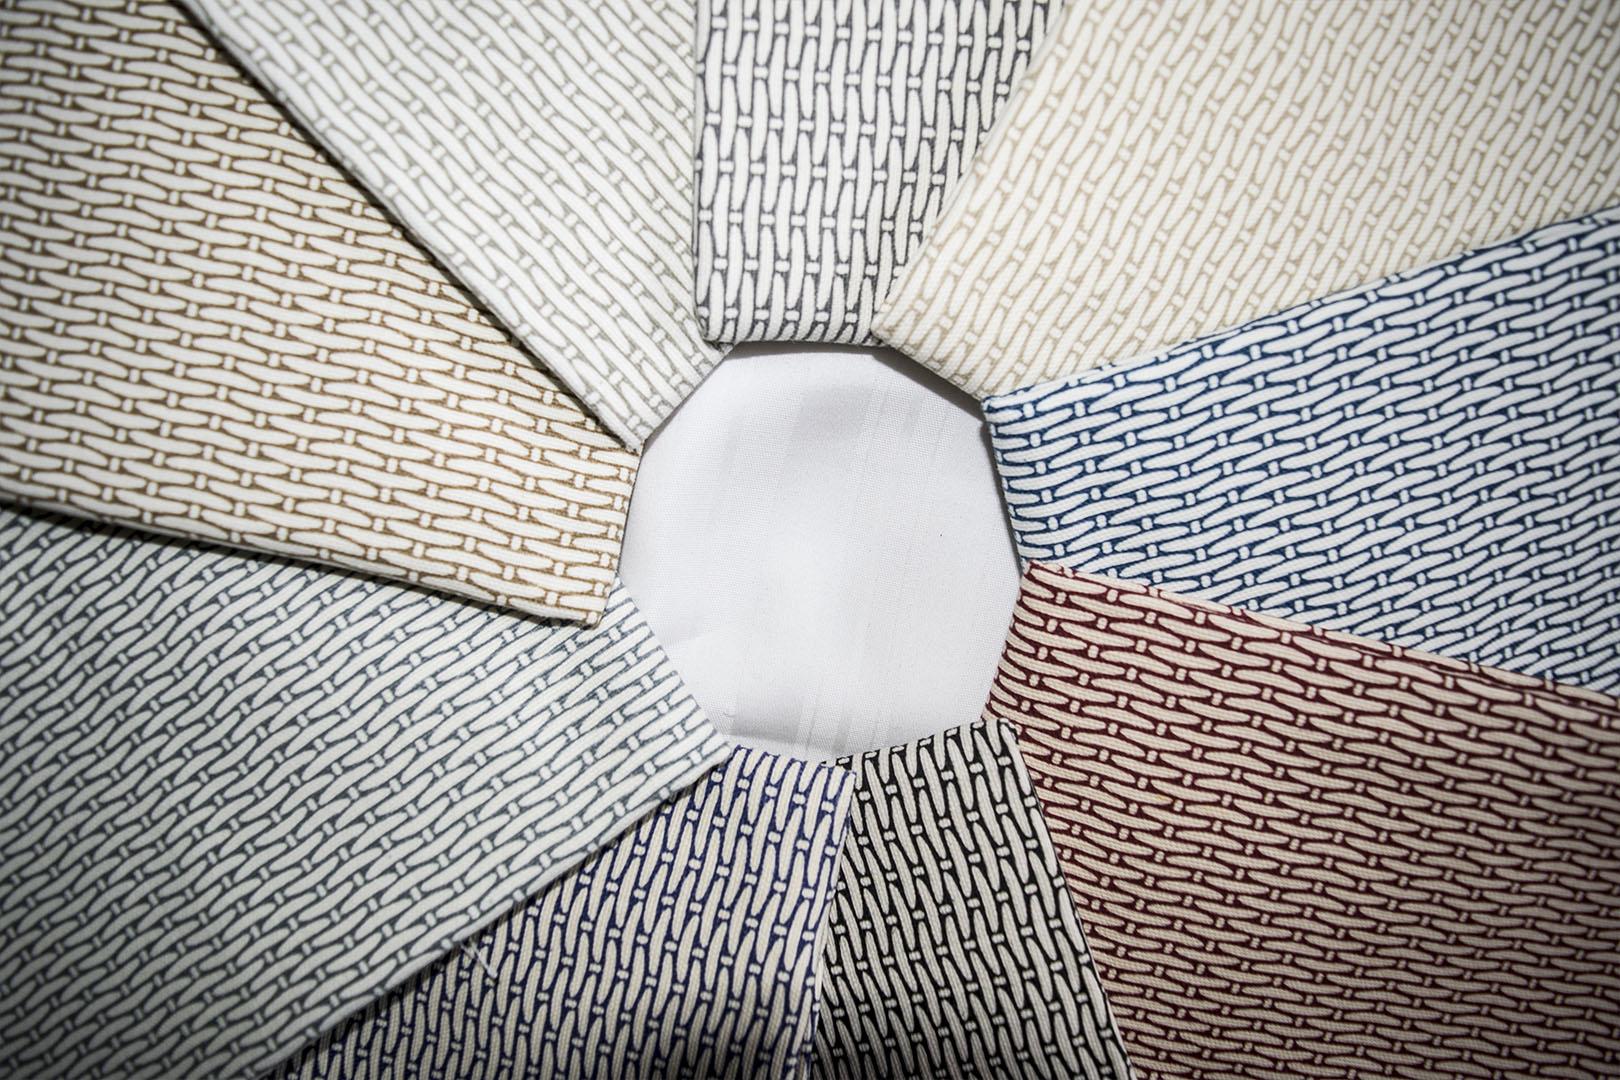 SPW #199: Basket Weave